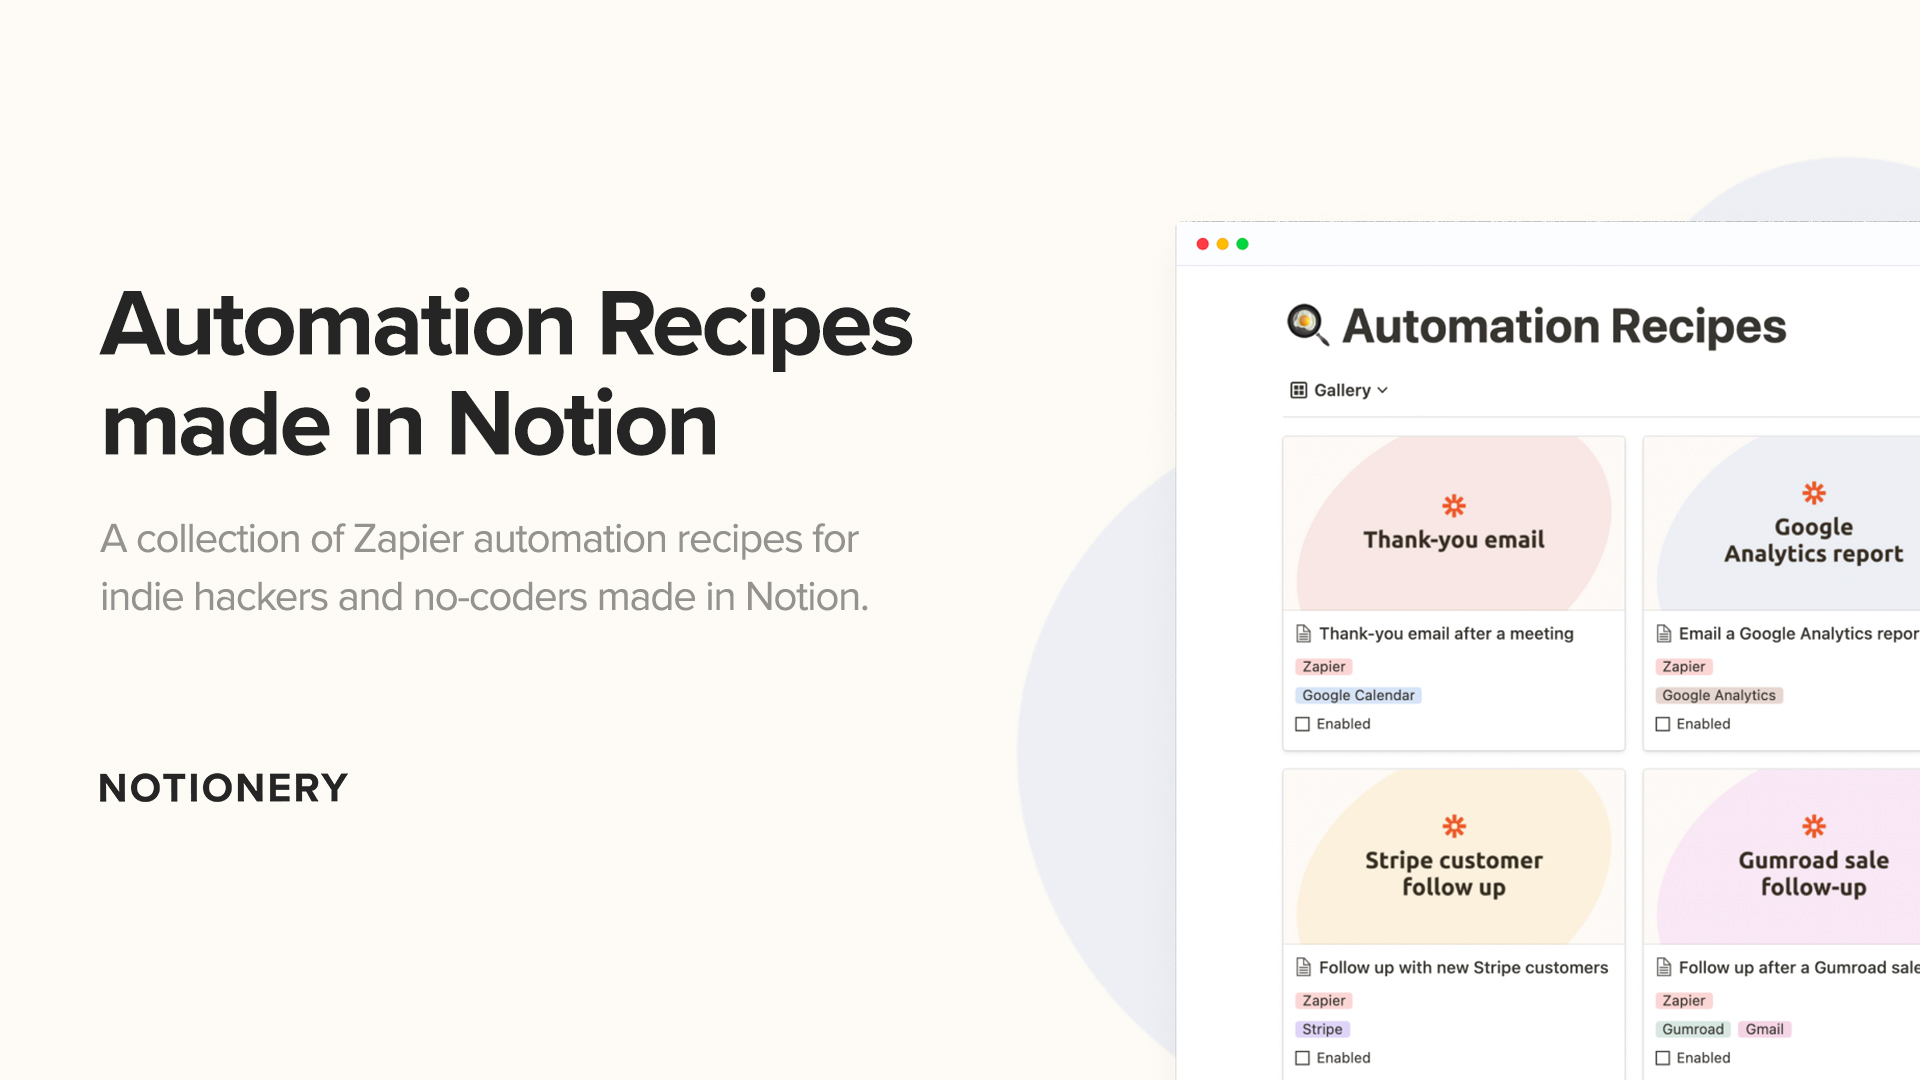 Automation Recipes